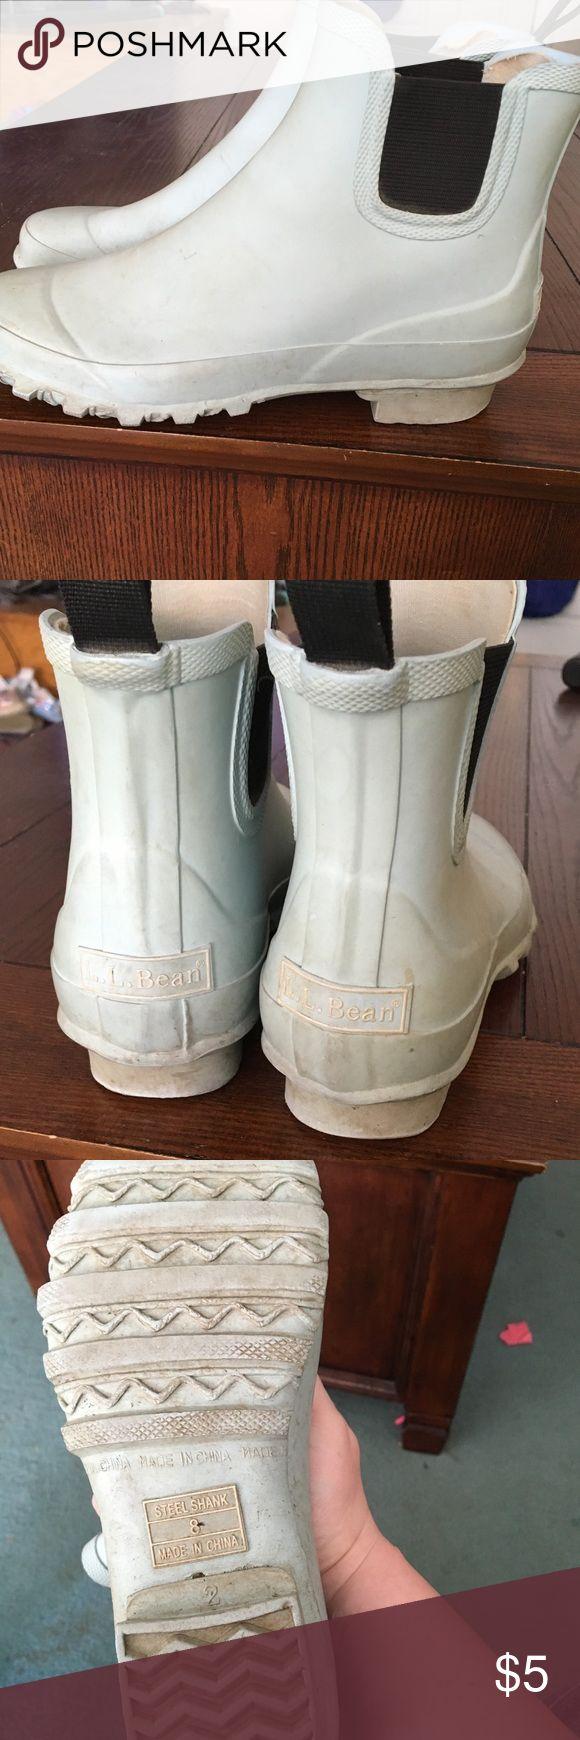 "LL Bean rain boots Used condition LL Bean rain boots. ""Steel Shank"". Ankle height LL Bean Shoes Winter & Rain Boots"